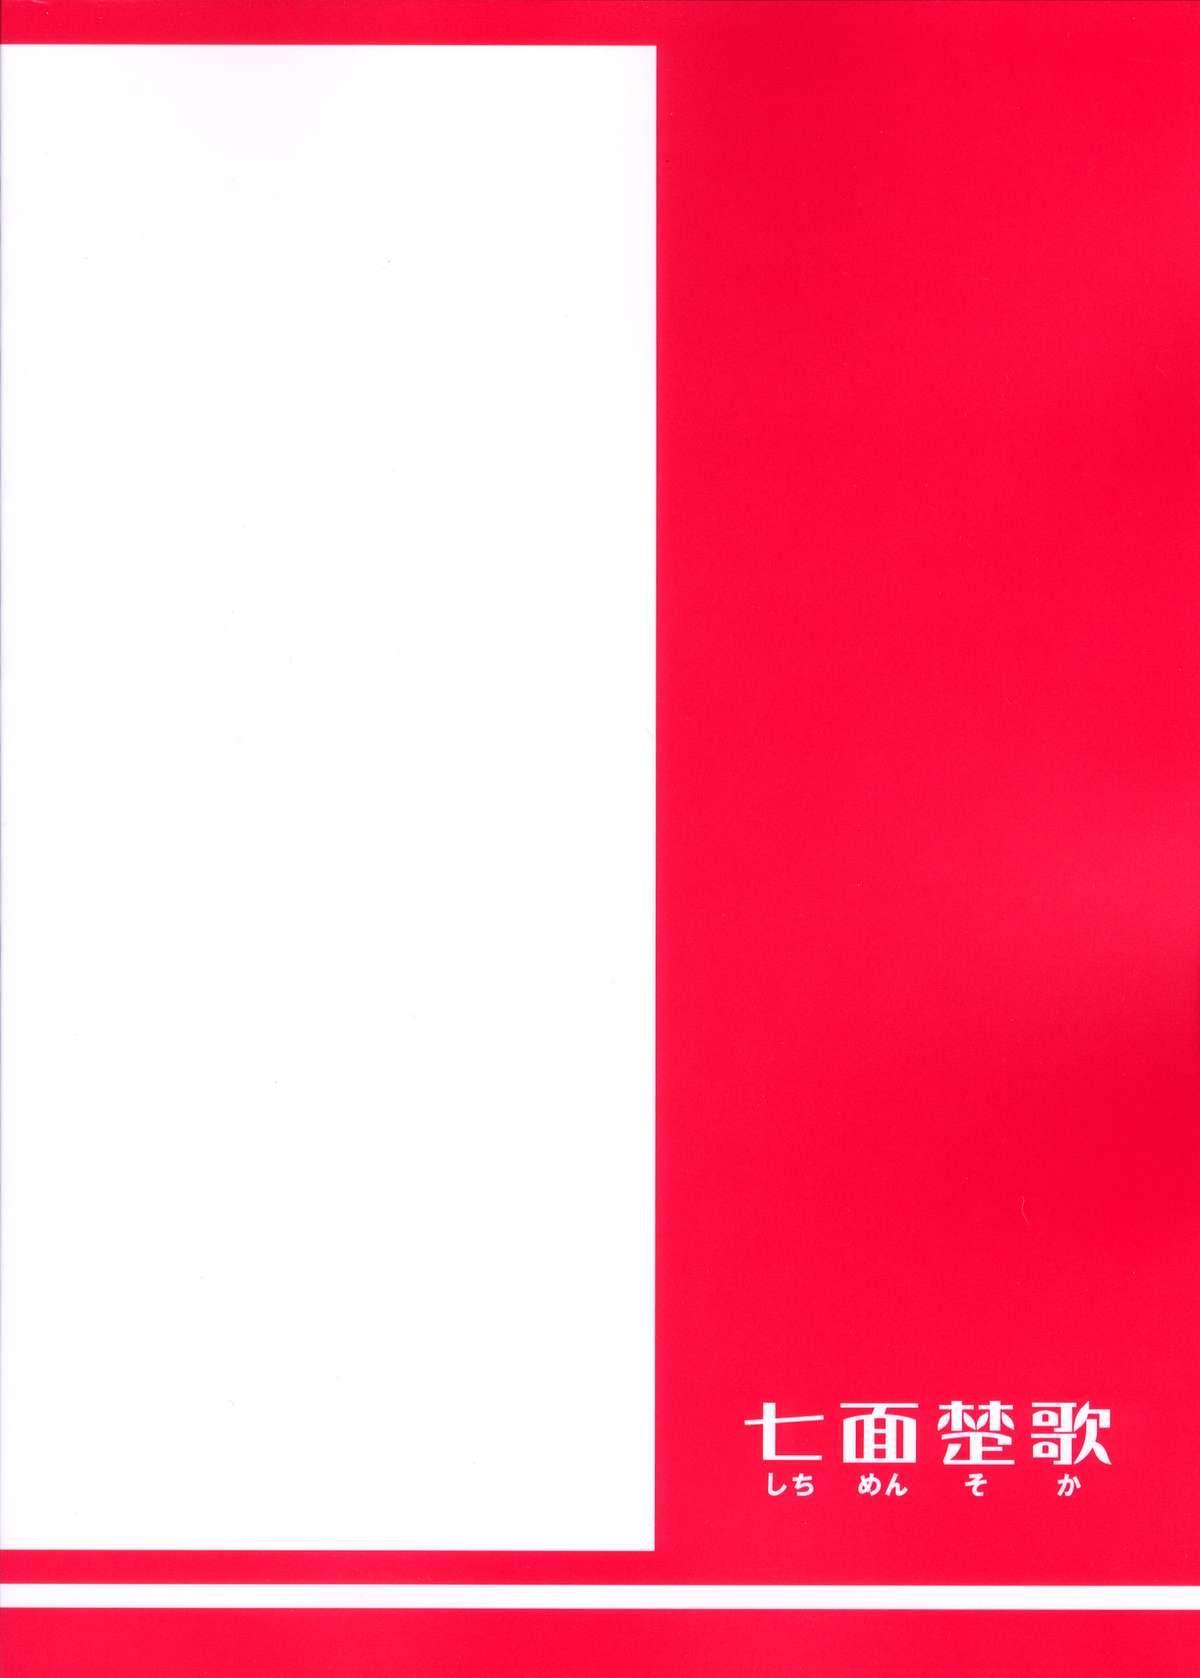 (C83) [Shichimen Soka (Sexyturkey)] Silica-chan ni Oshiri Ijirareru Hon | Silica-chan Playing With Your Butt Book (Sword Art Online) [English] 17